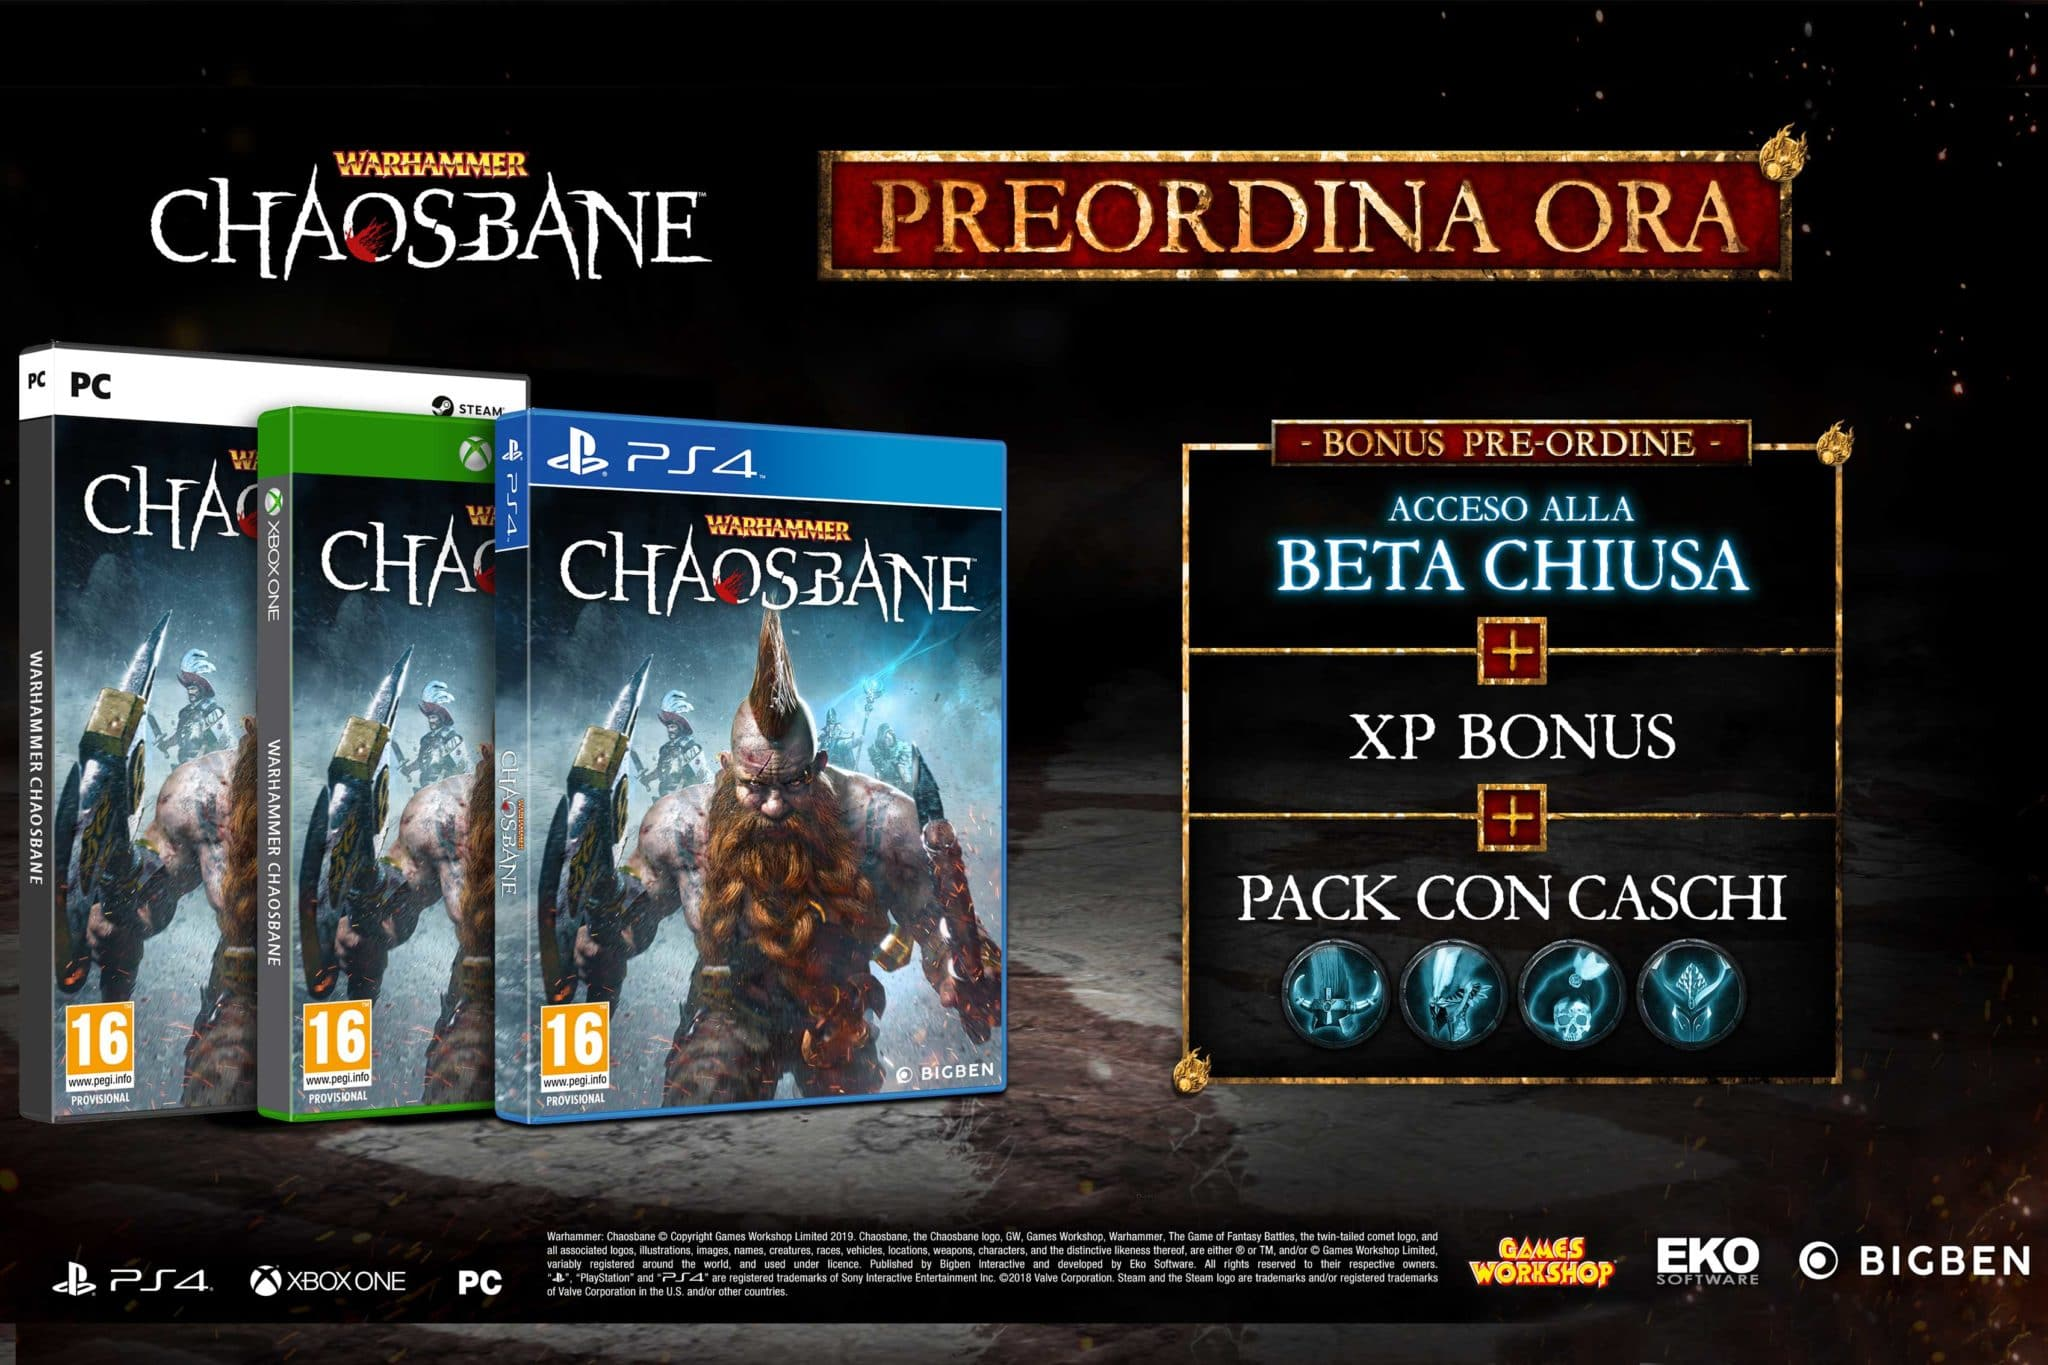 Ongame_franchising_videogames_WARHAMMER_CHAOSBANE (3)